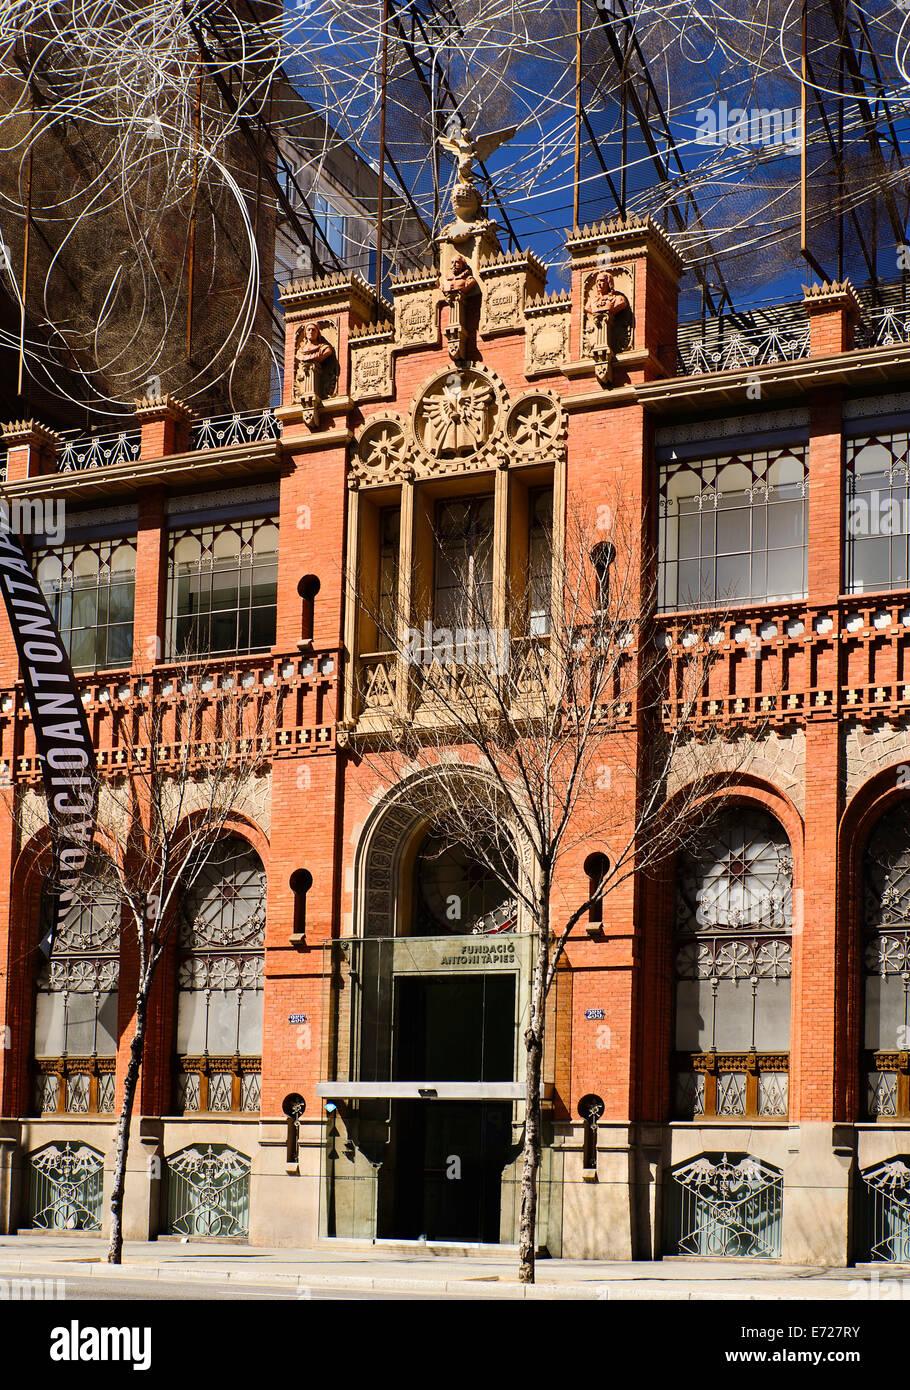 Spanien, Katalonien, Barcelona, Fassade der Fundacio Antoni Tapies. Stockbild